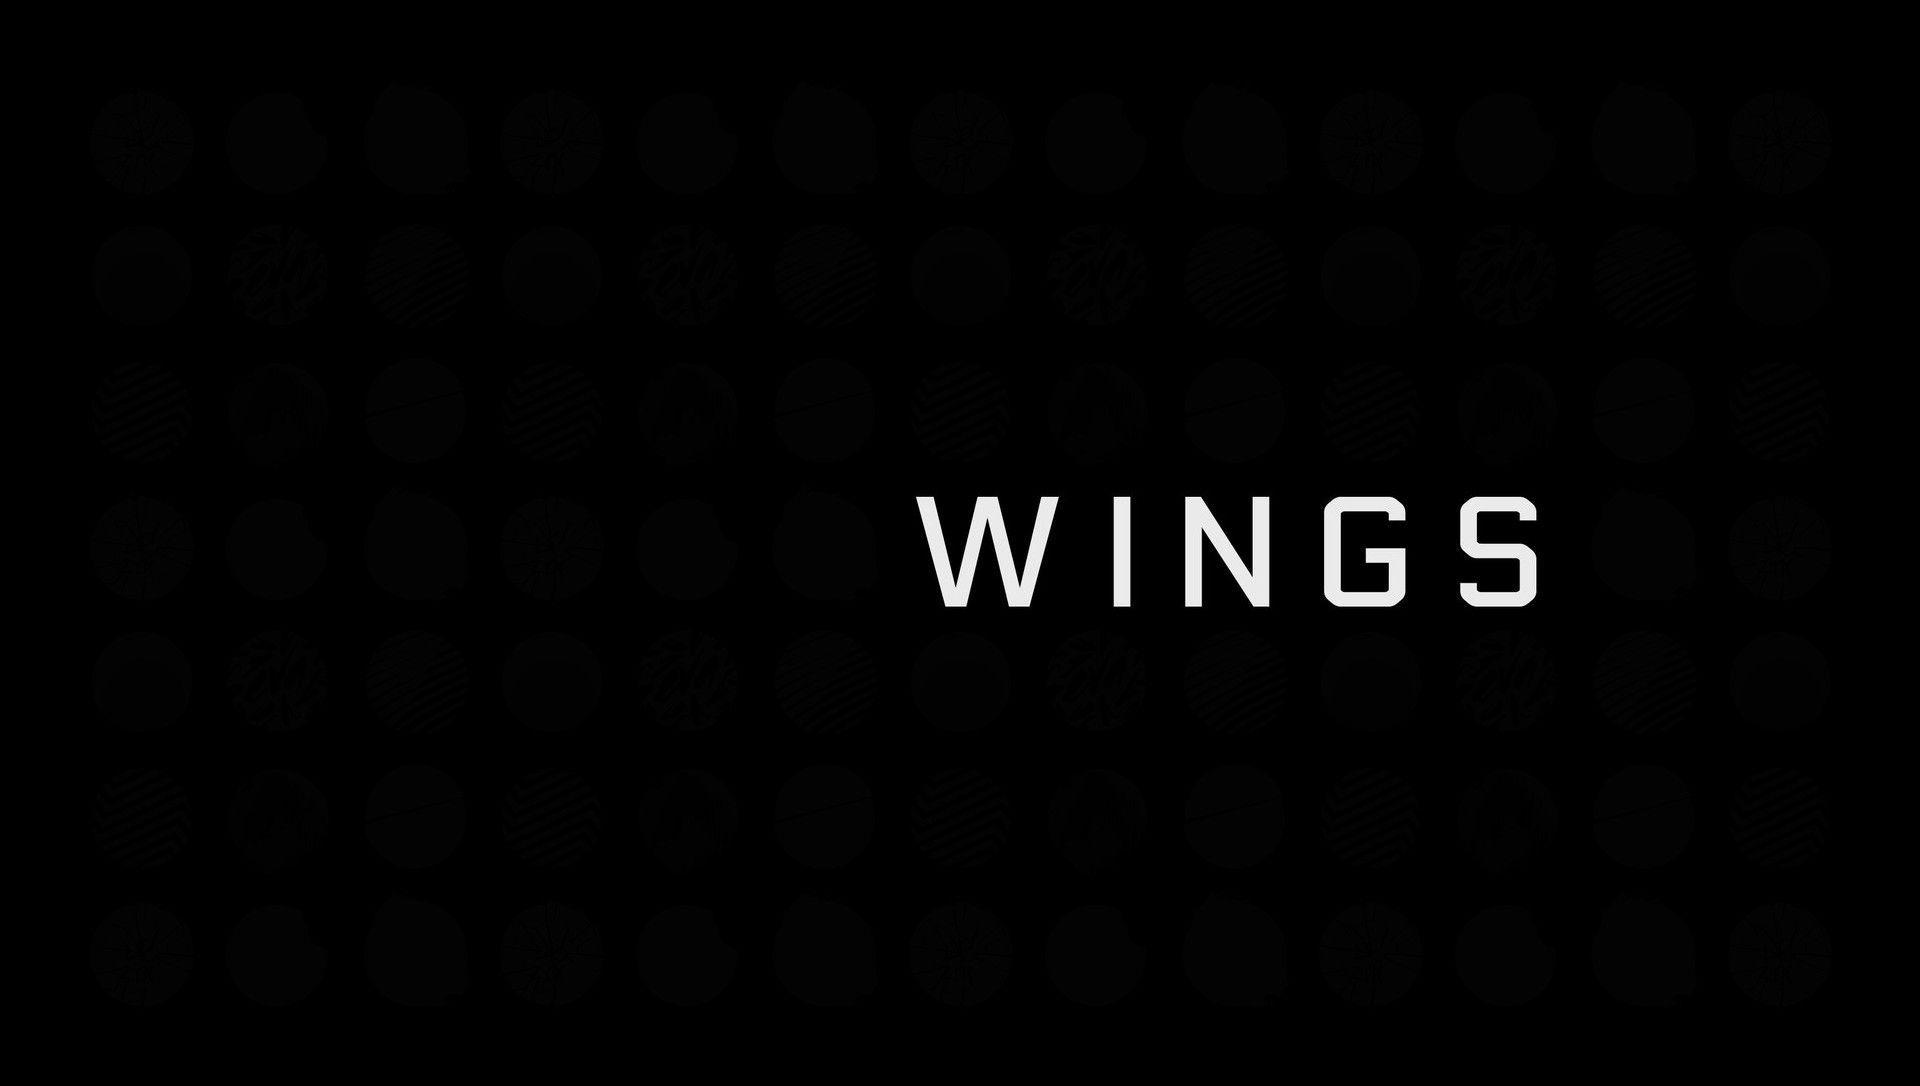 K Pop Bts Wallpaper In 2020 Bts Laptop Wallpaper Bts Wings Wallpaper Bts Wallpaper